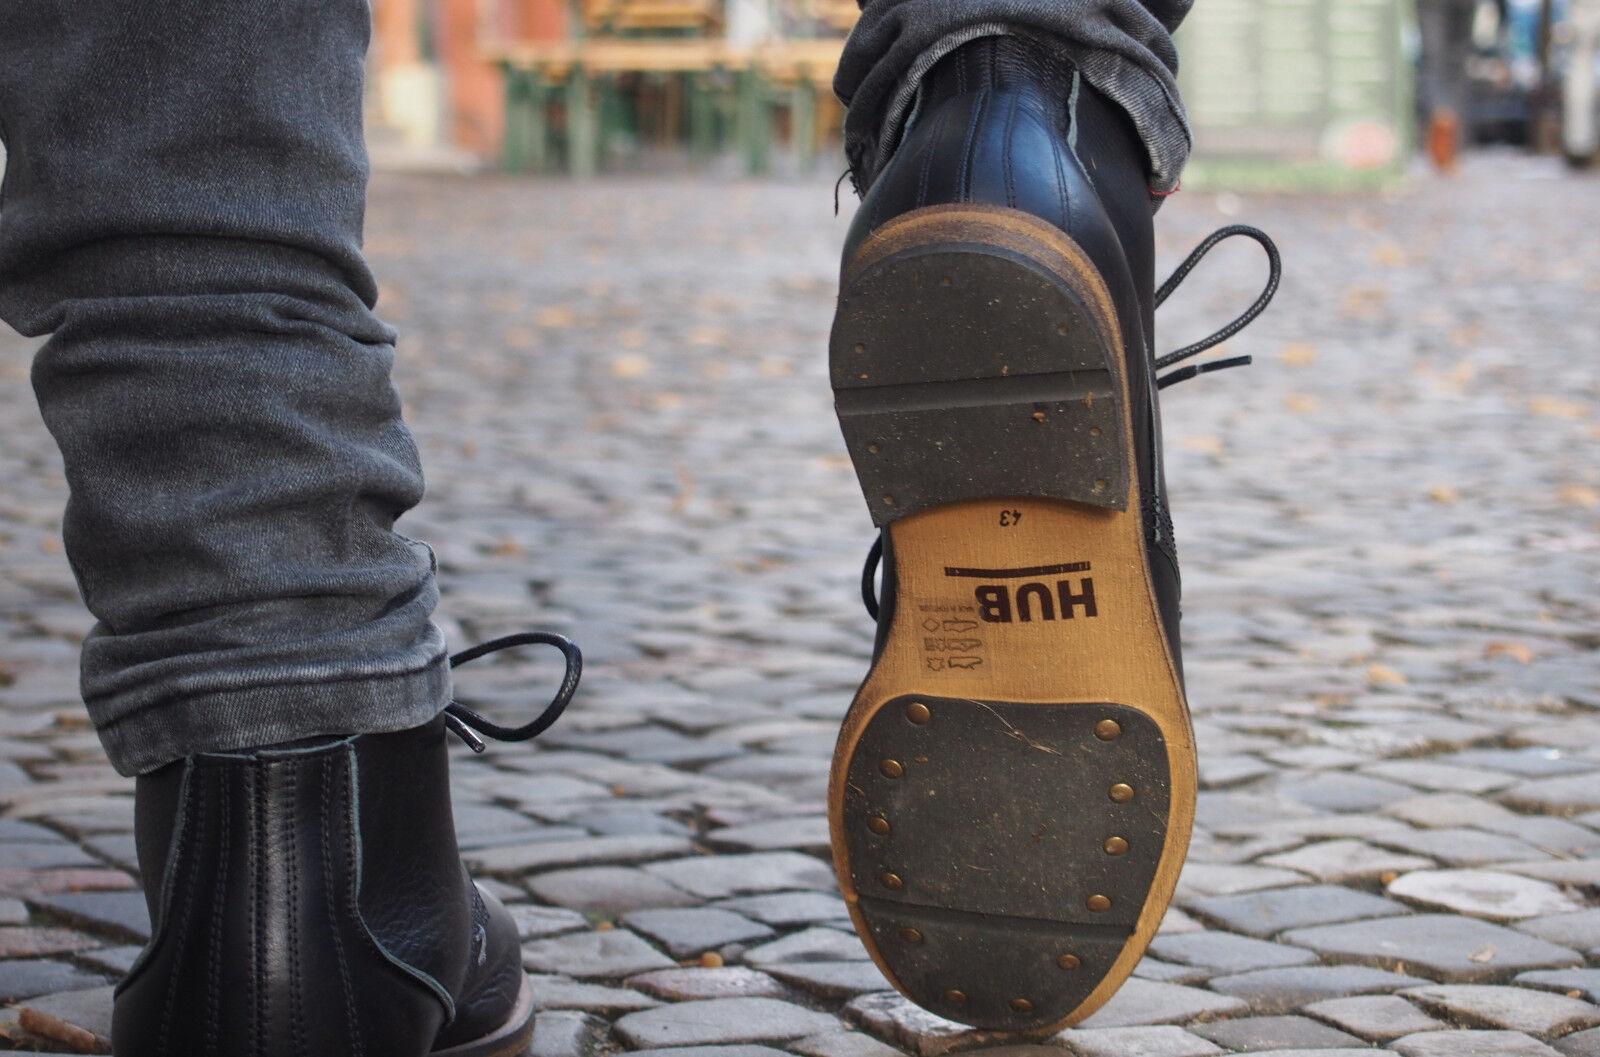 HUB Footwear Herrenschuhe SPURS L black black black schwarz Echtleder Schnürschuhe NEU SALE ada8a6